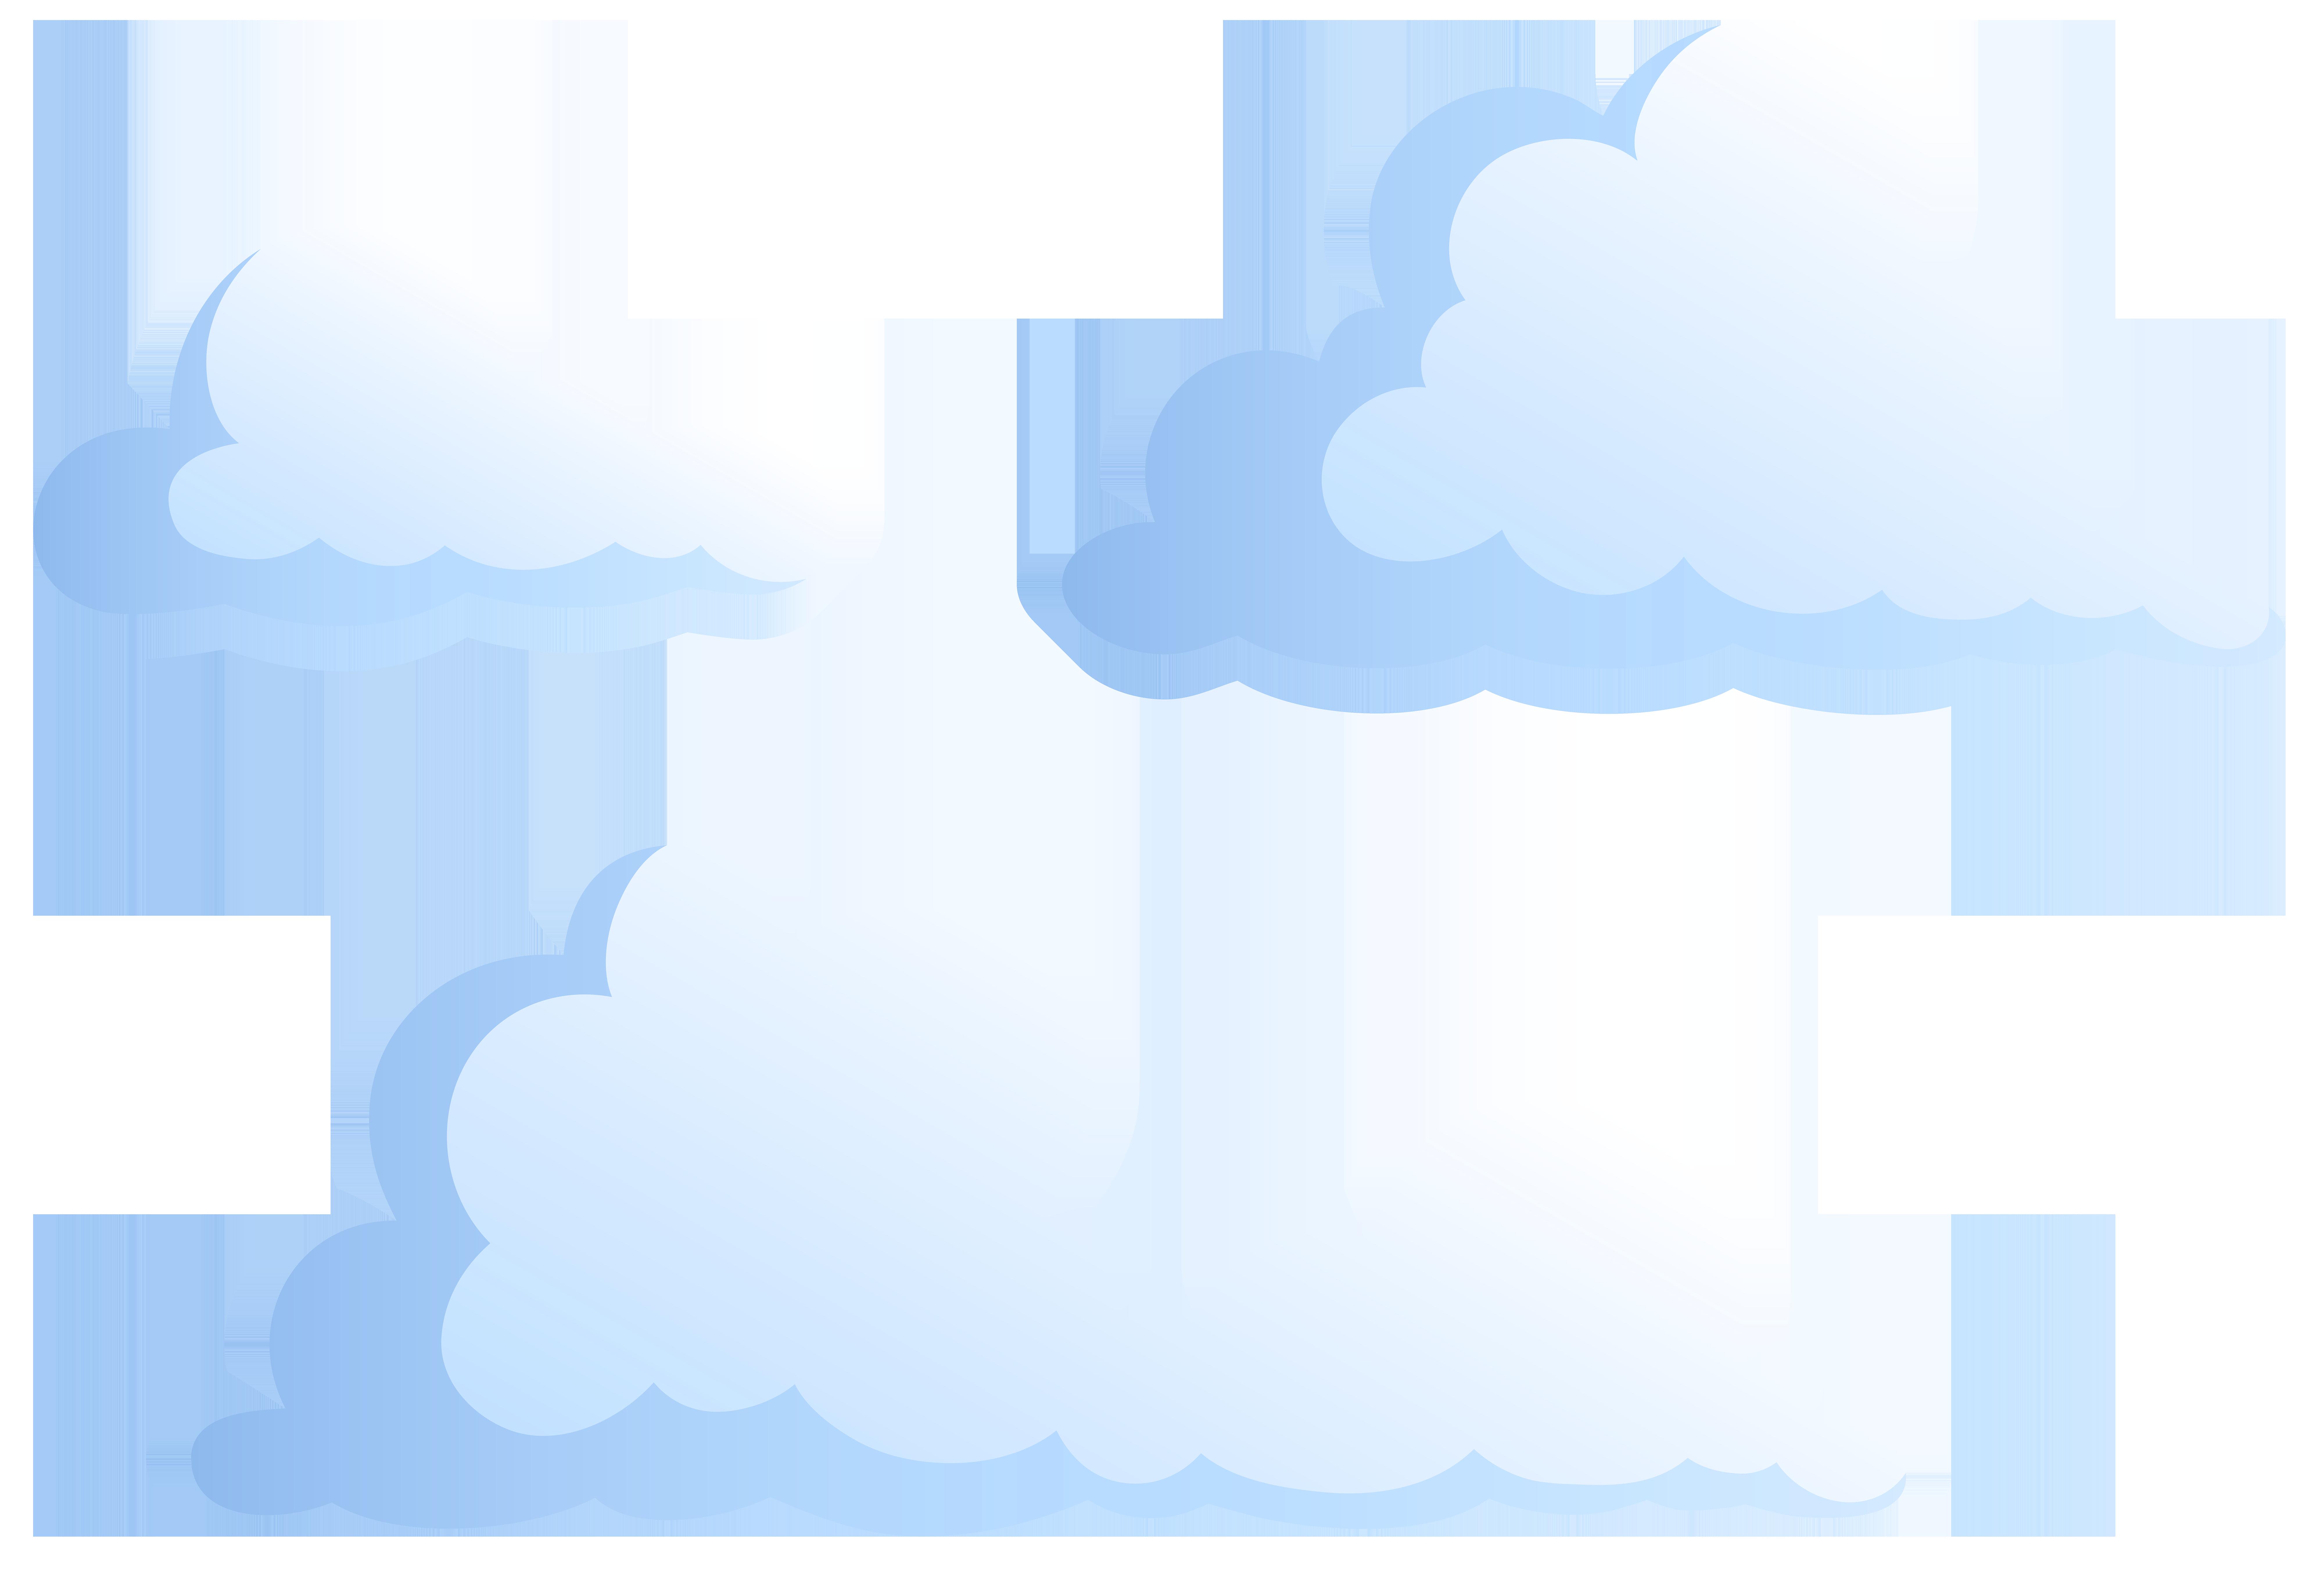 Cloud Png Clipart.